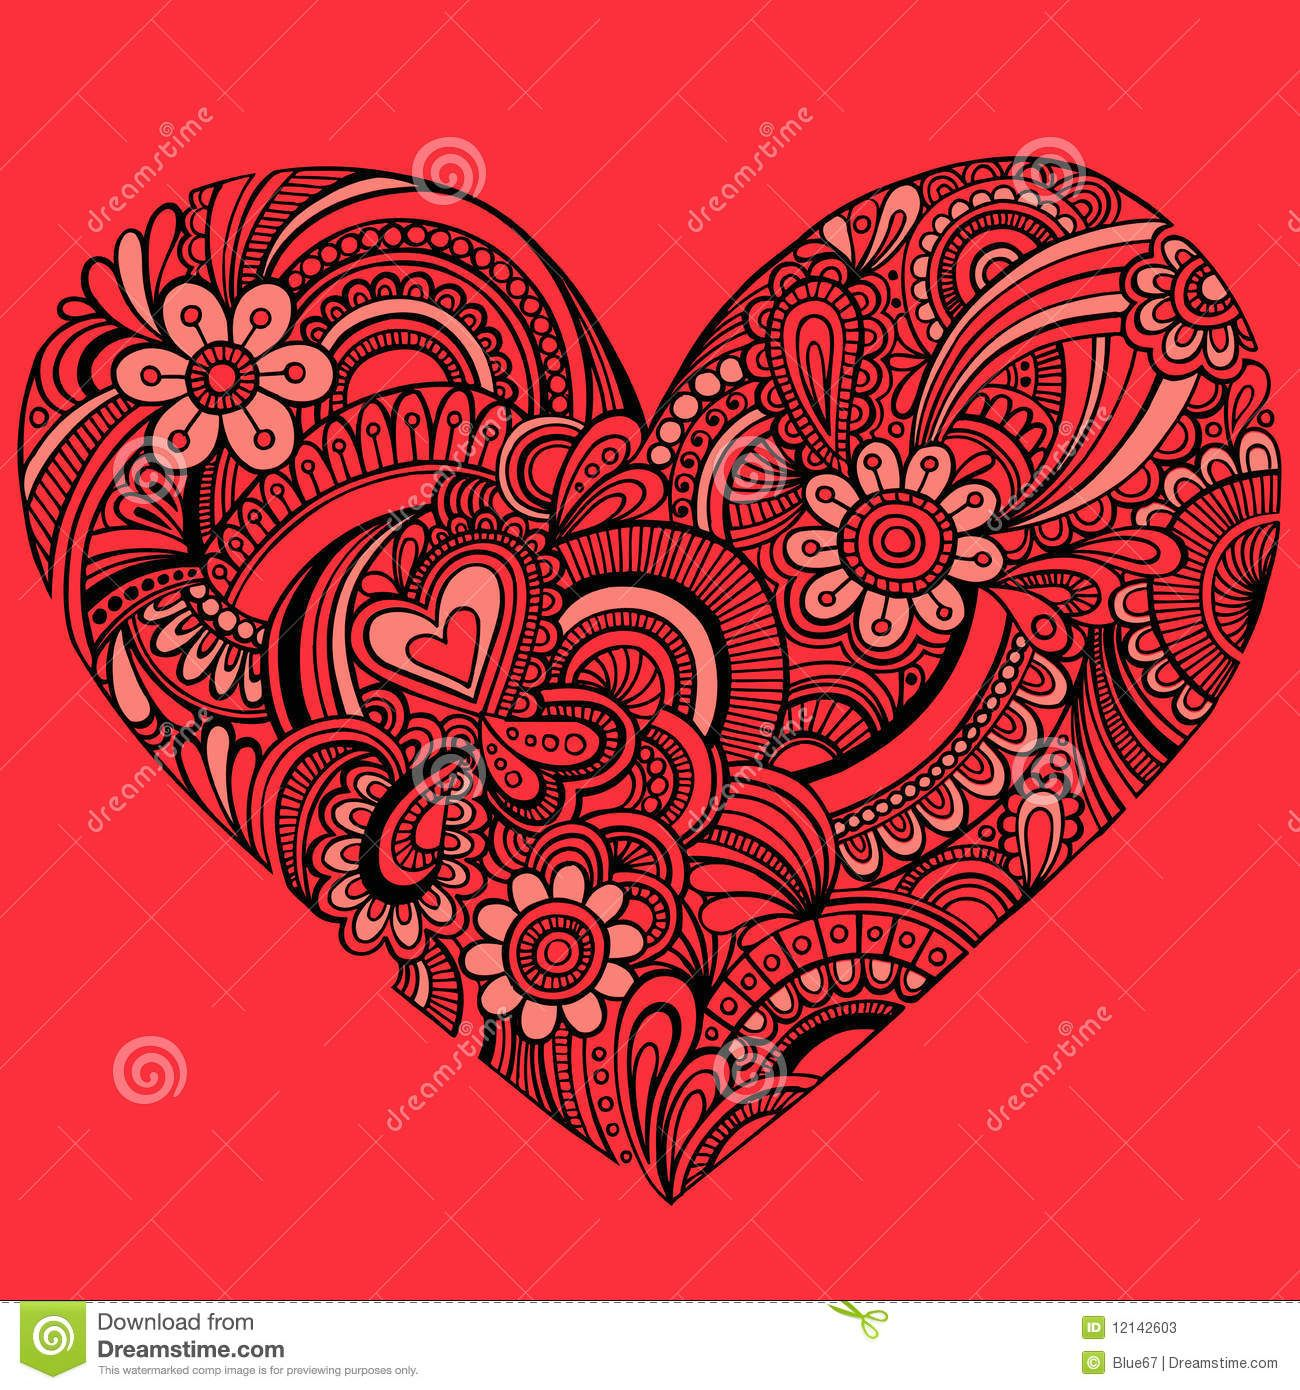 paisley heart tattoos google search tattoo pinterest paisley rh pinterest co uk Paisley Tattoo Art Paisley Flower Tattoo